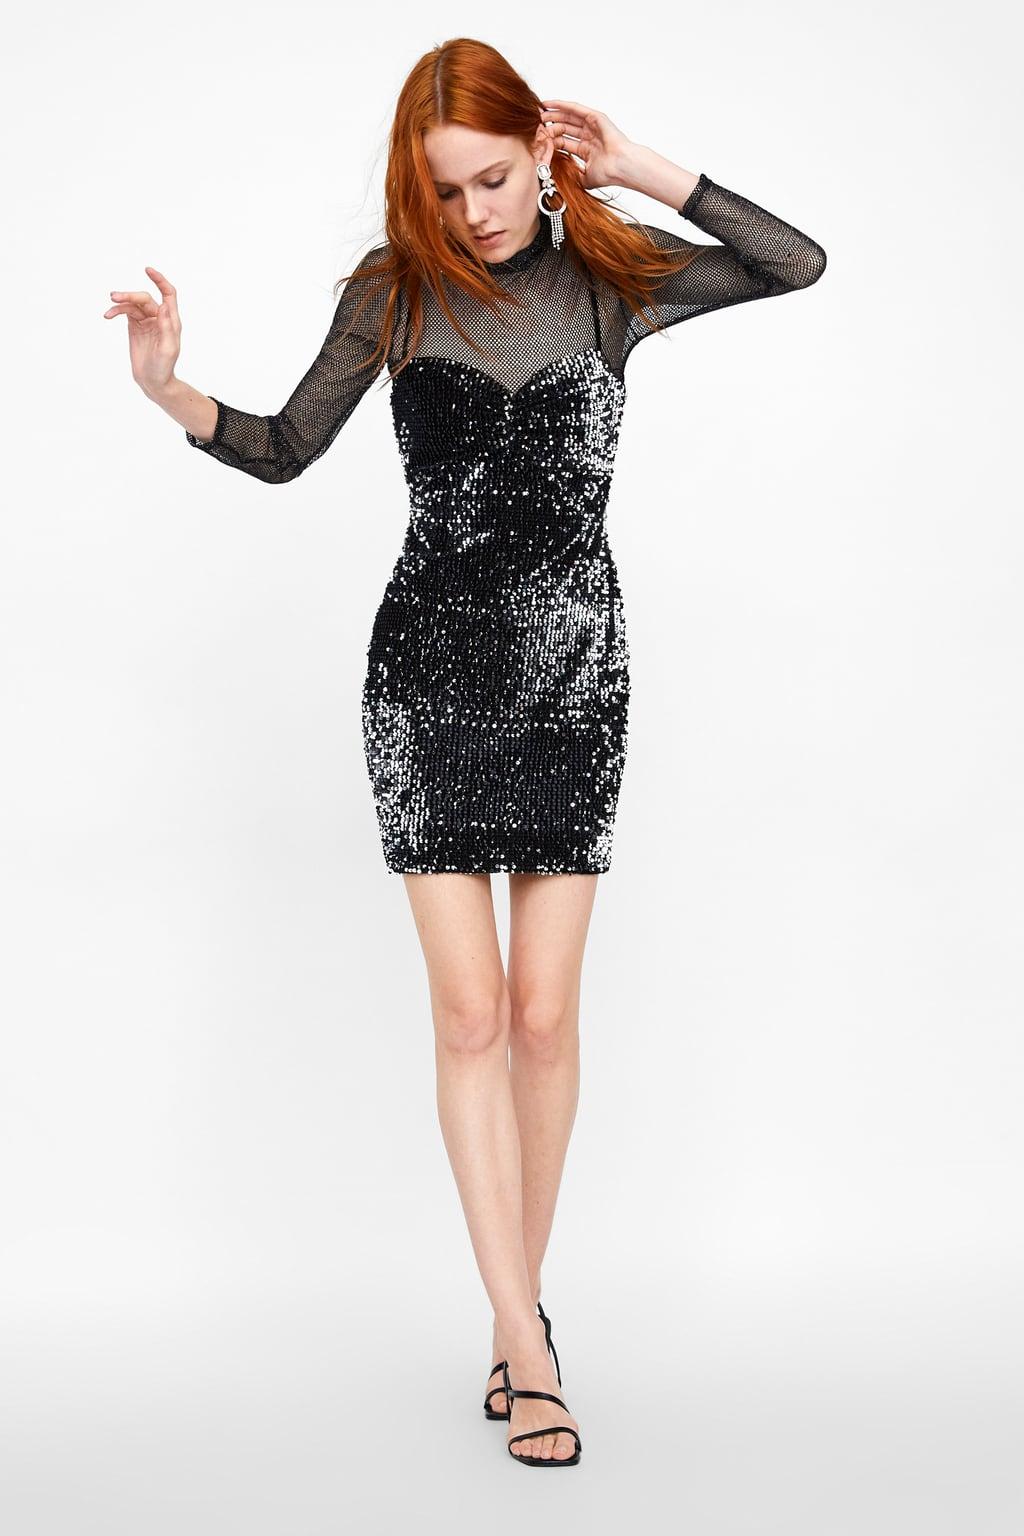 online buscar nuevo concepto Vestido nochevieja Zara 3 – Invitada Perfecta by Sandra